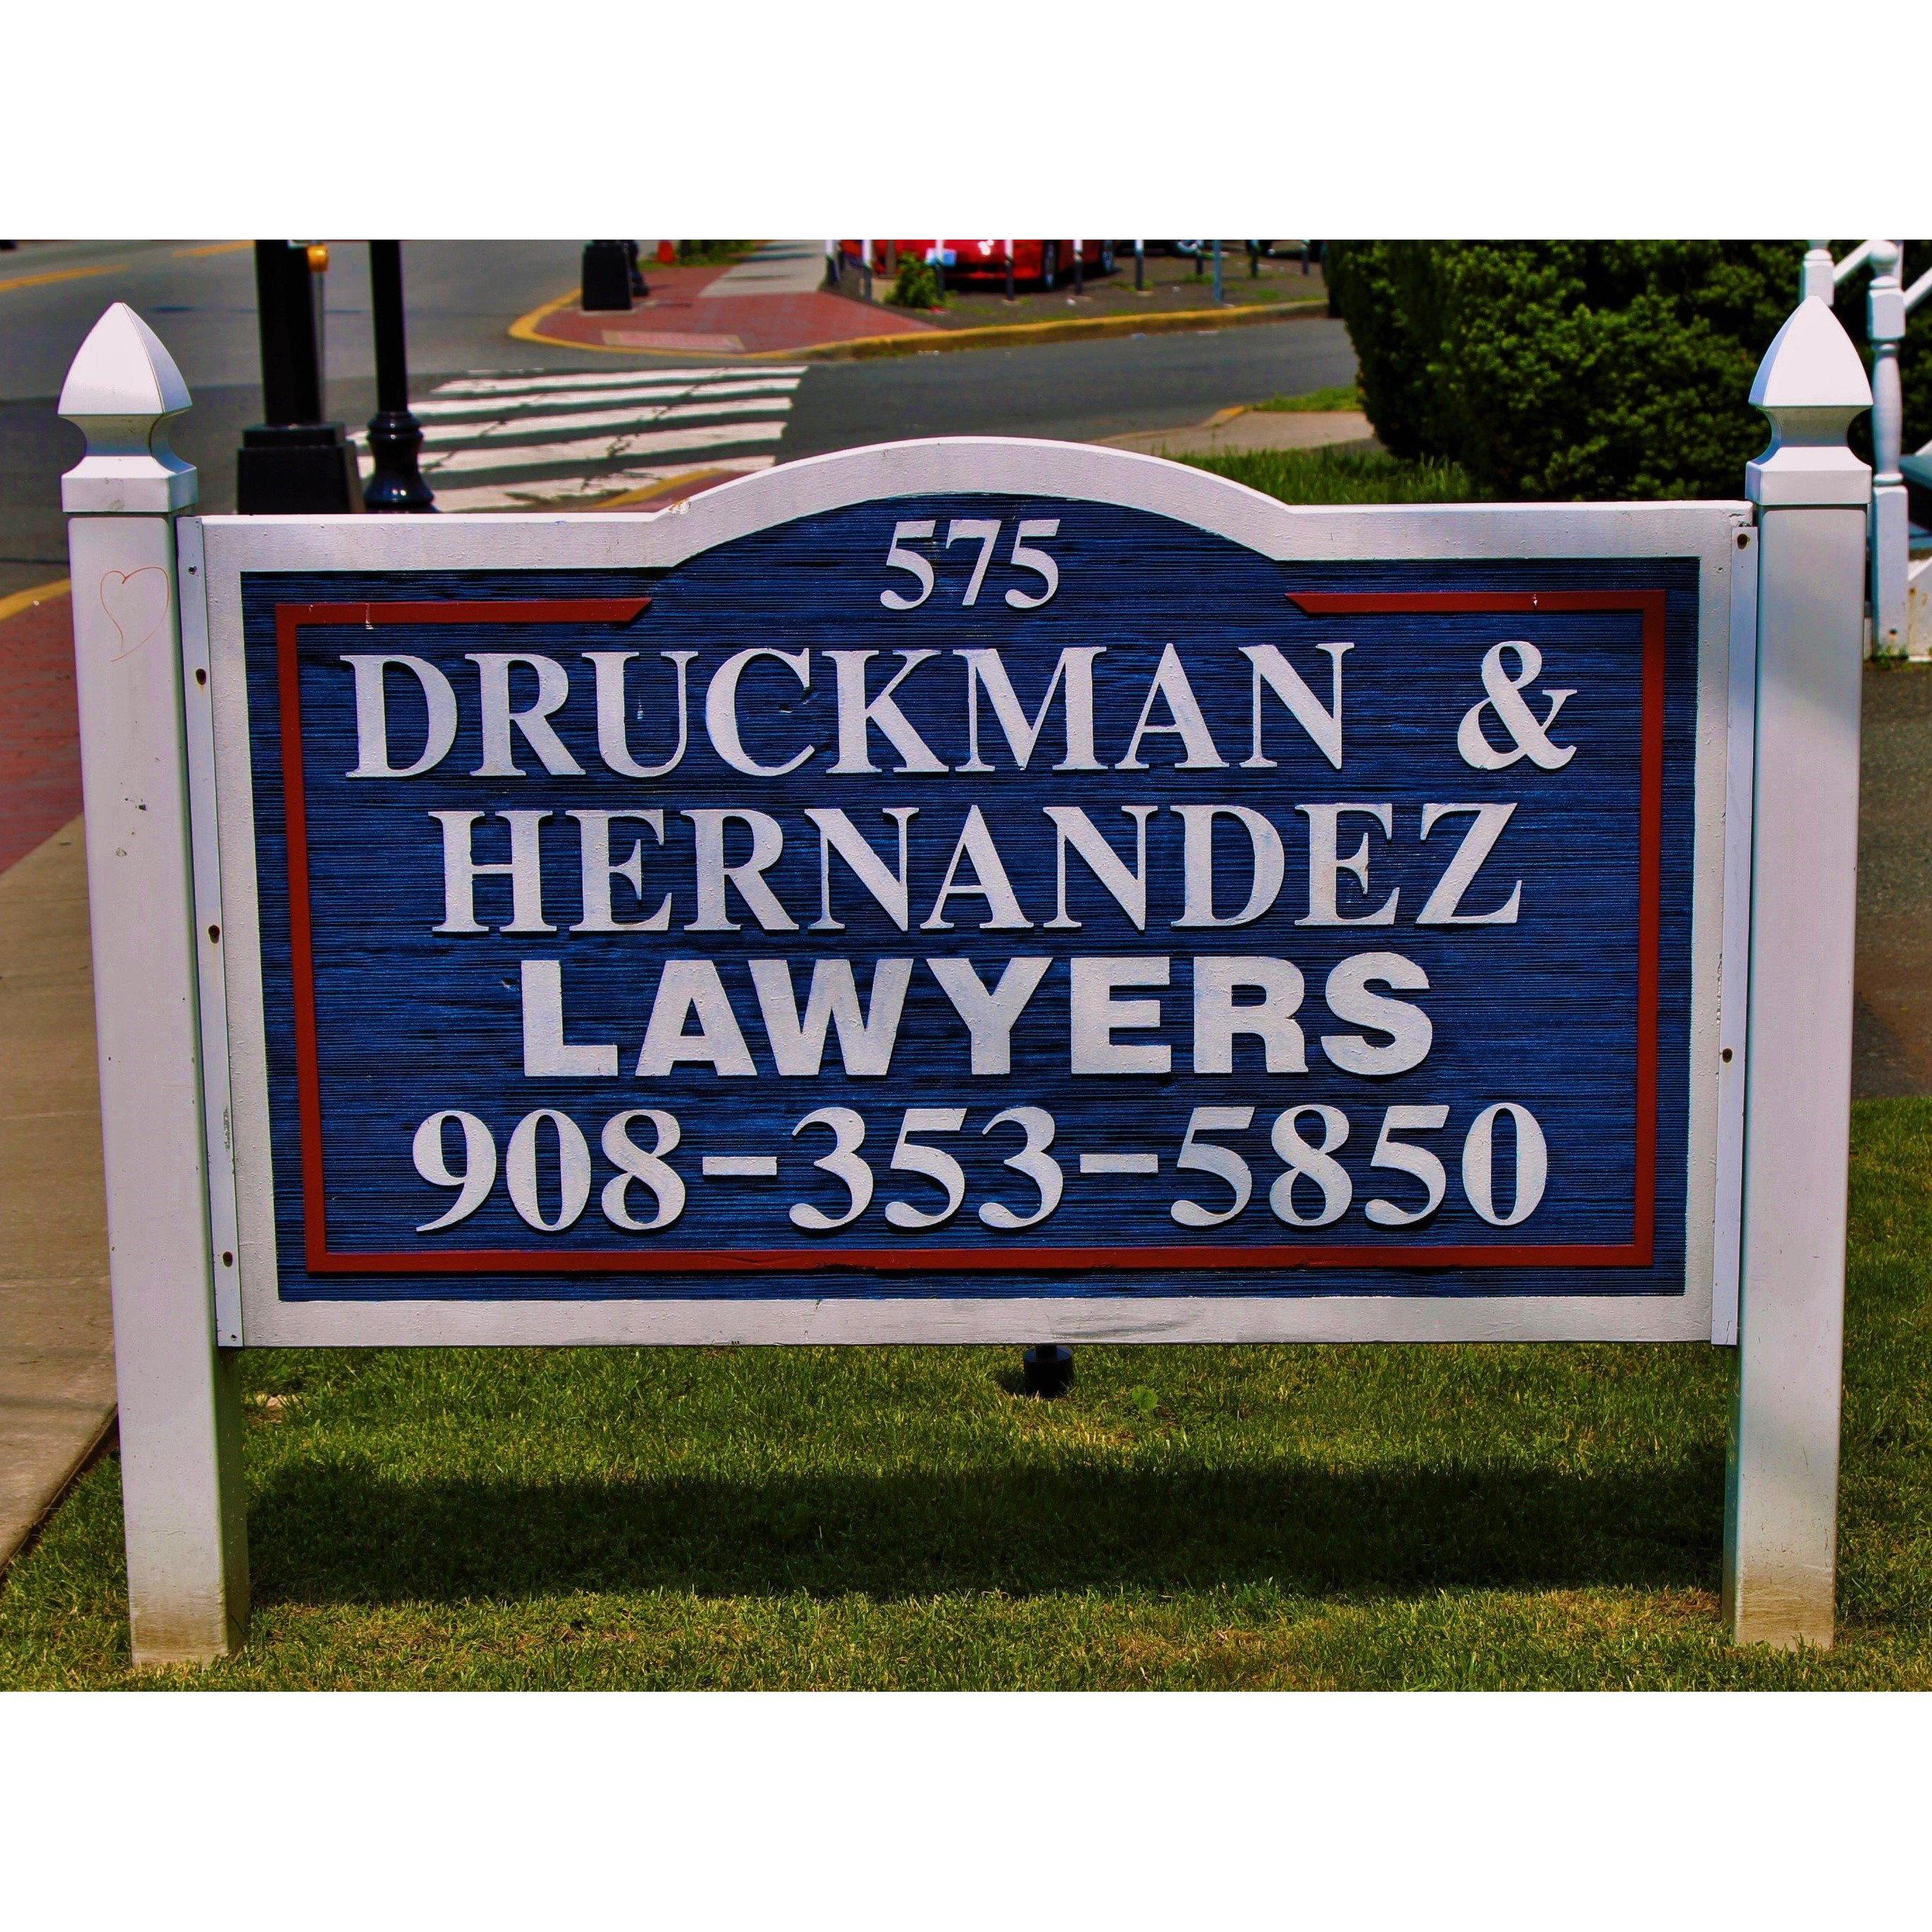 Druckman & Hernandez